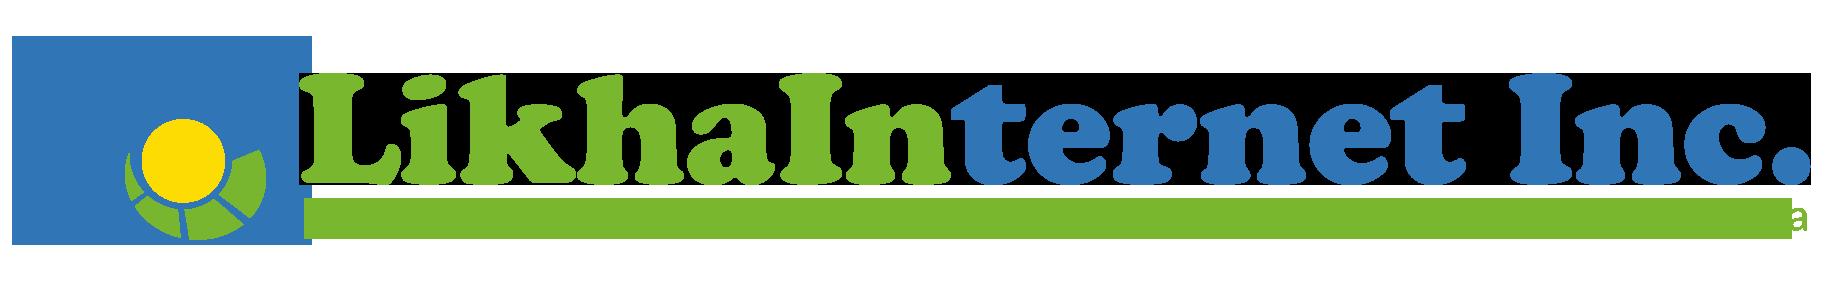 LikhaInternet Inc